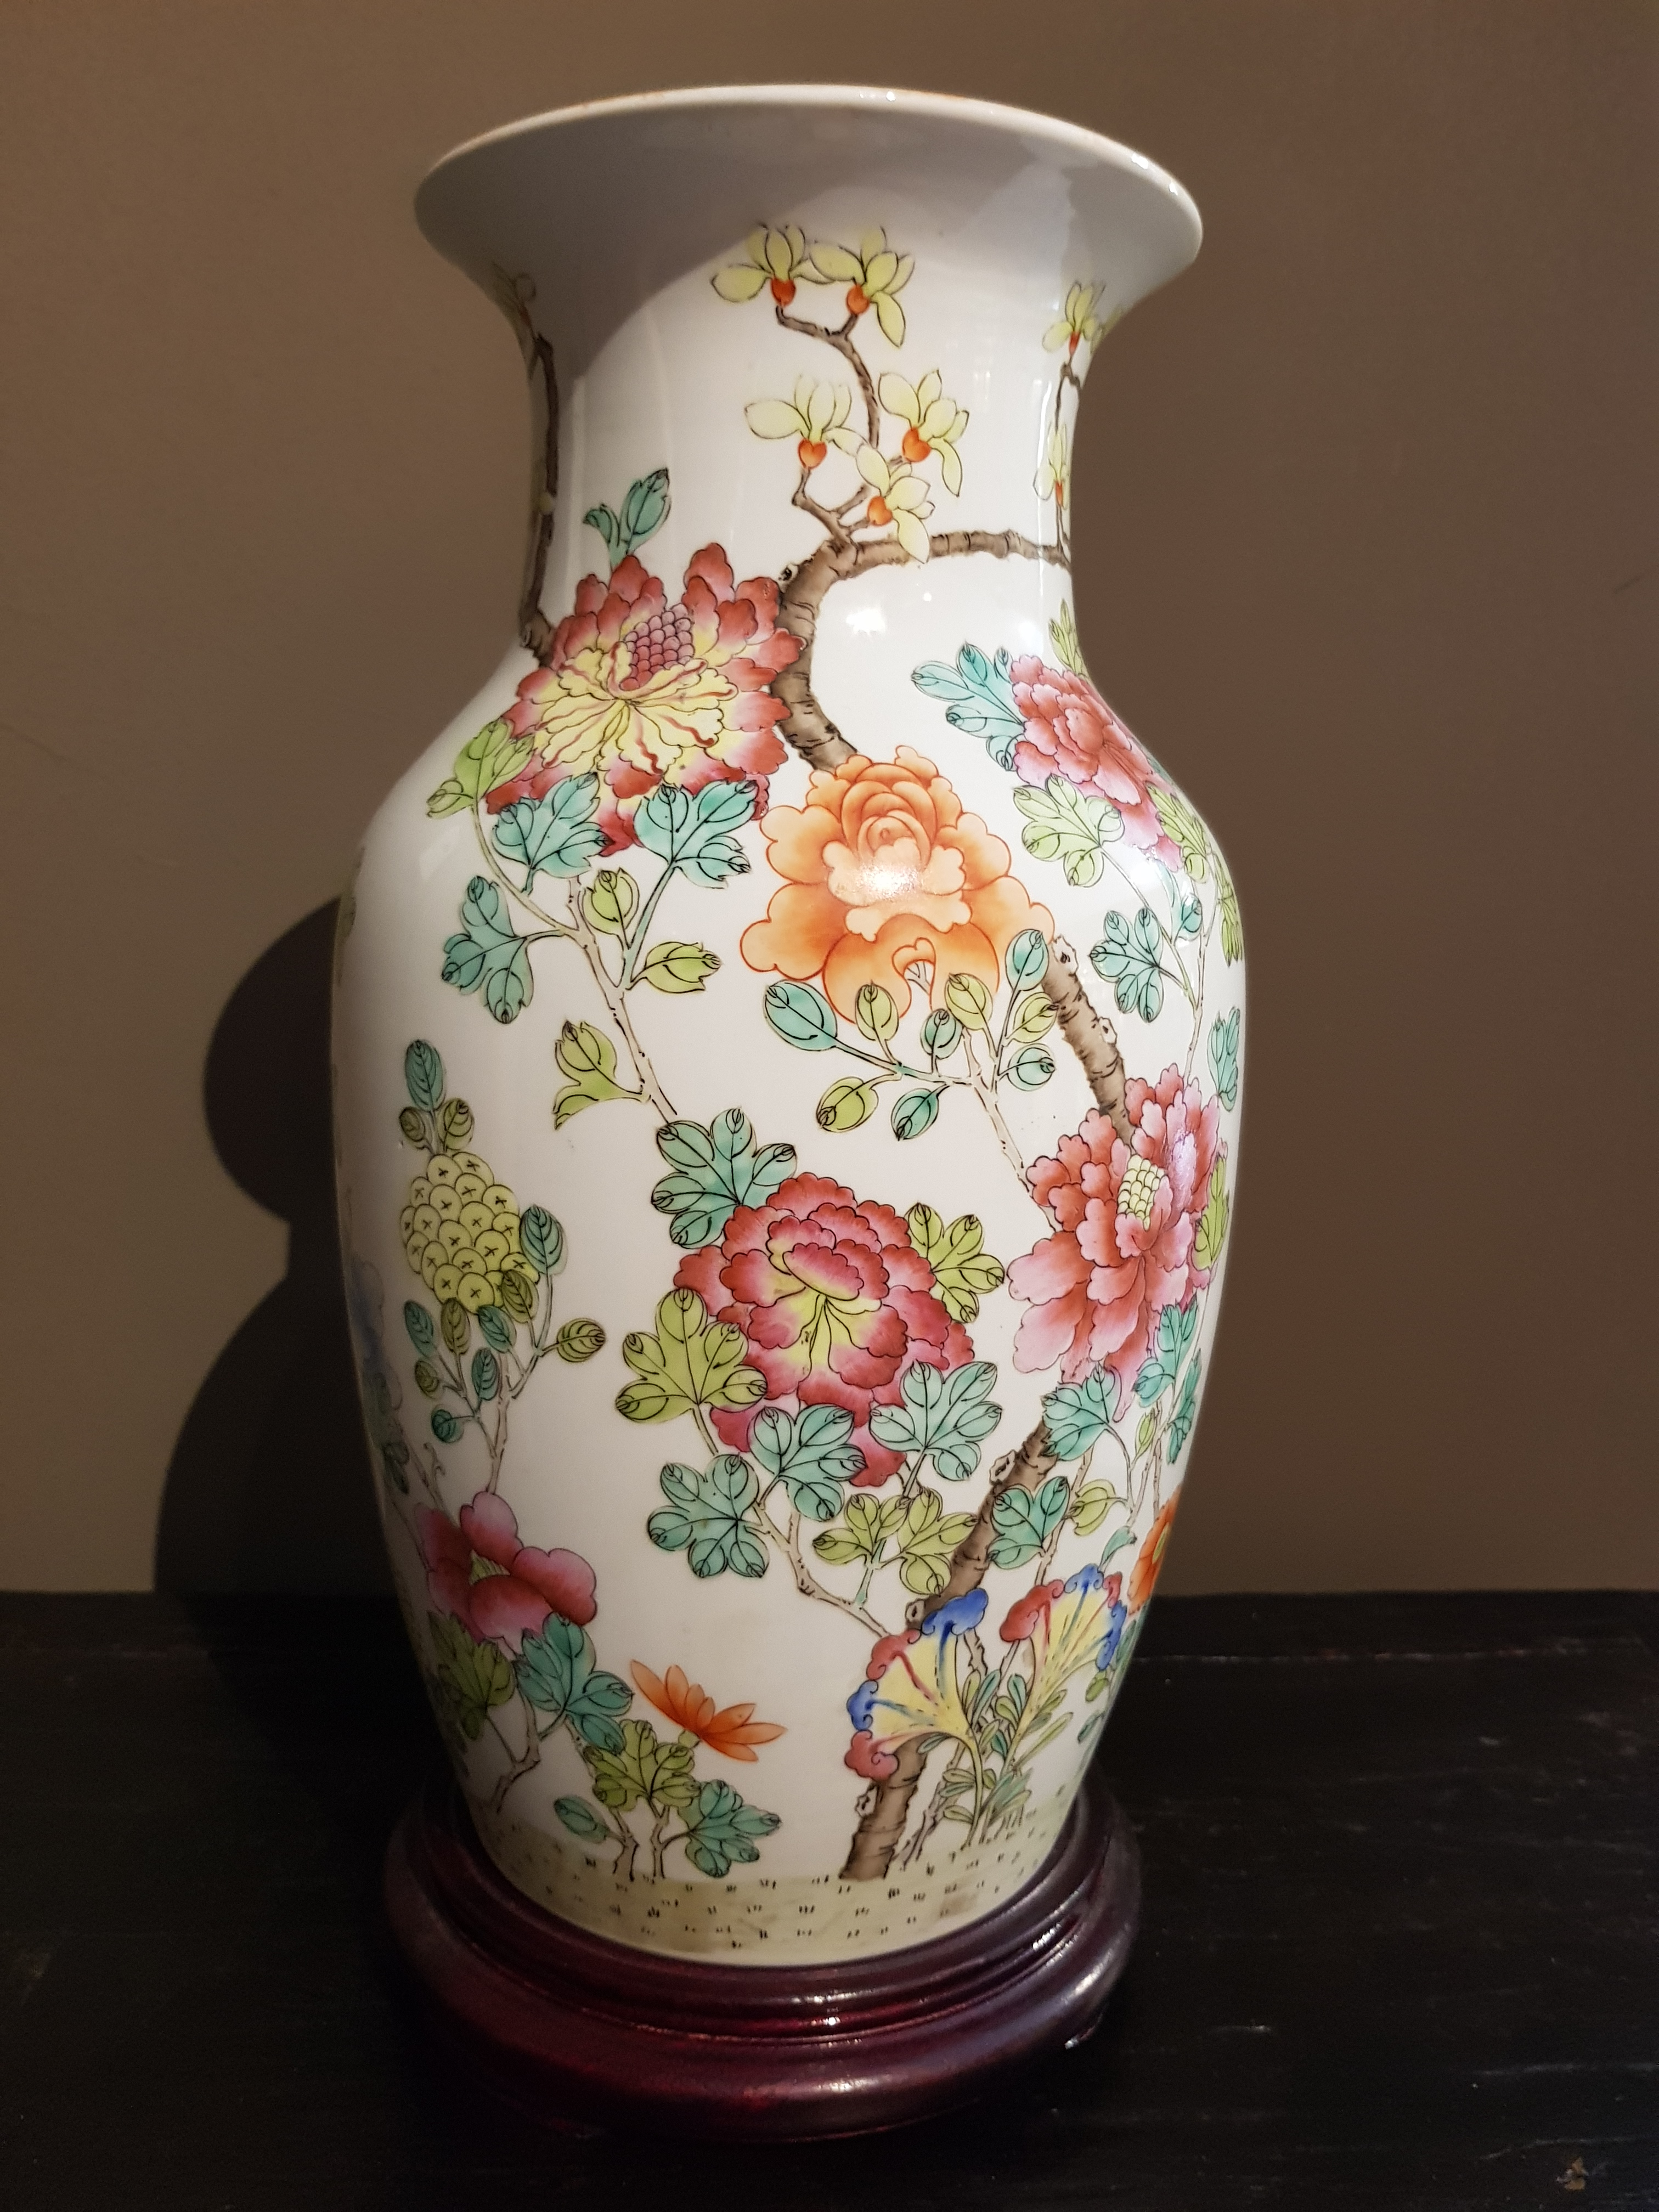 Vase en porcelaine de Chine - Famille Rose - 19/20ème. Image